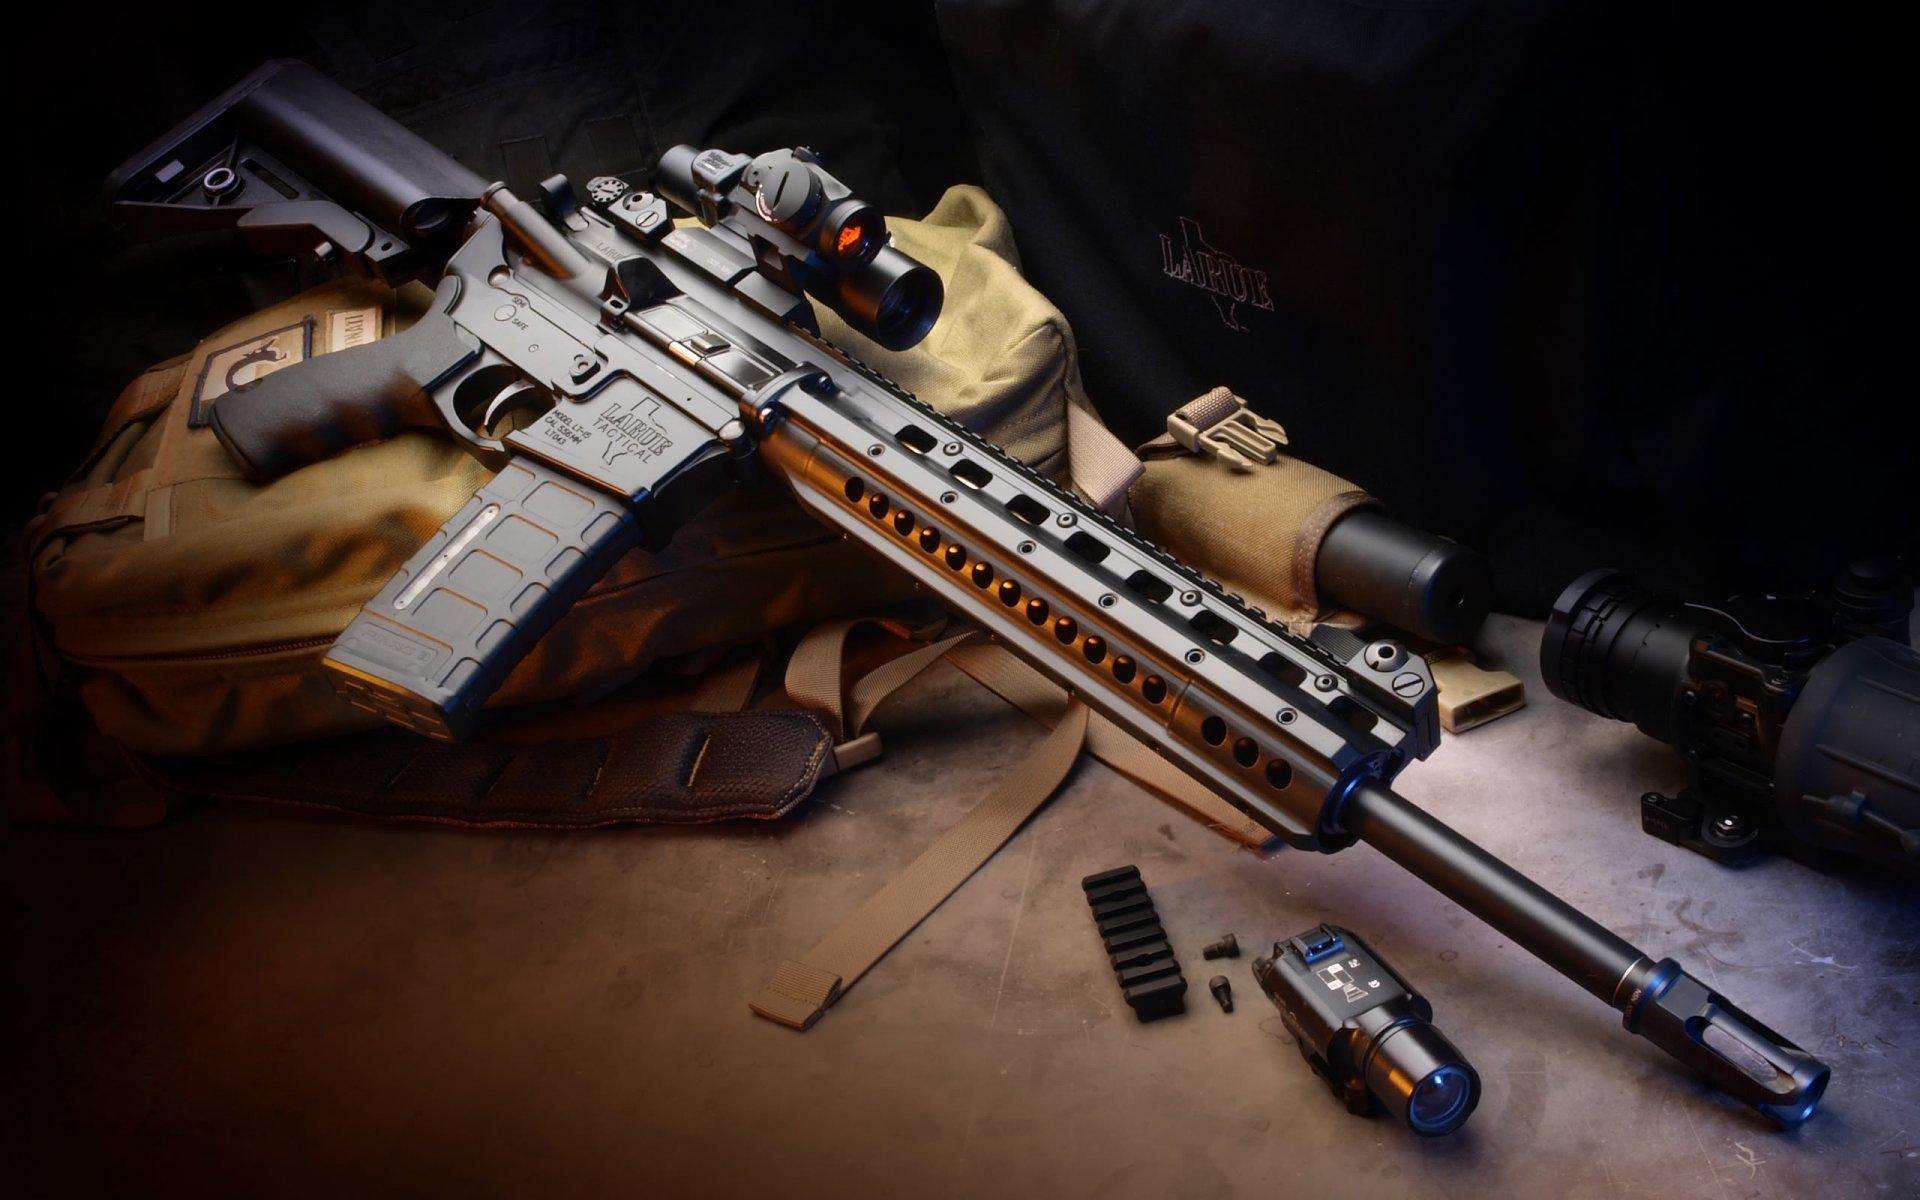 HQ LaRue Assault Rifle Wallpapers   File 239.71Kb